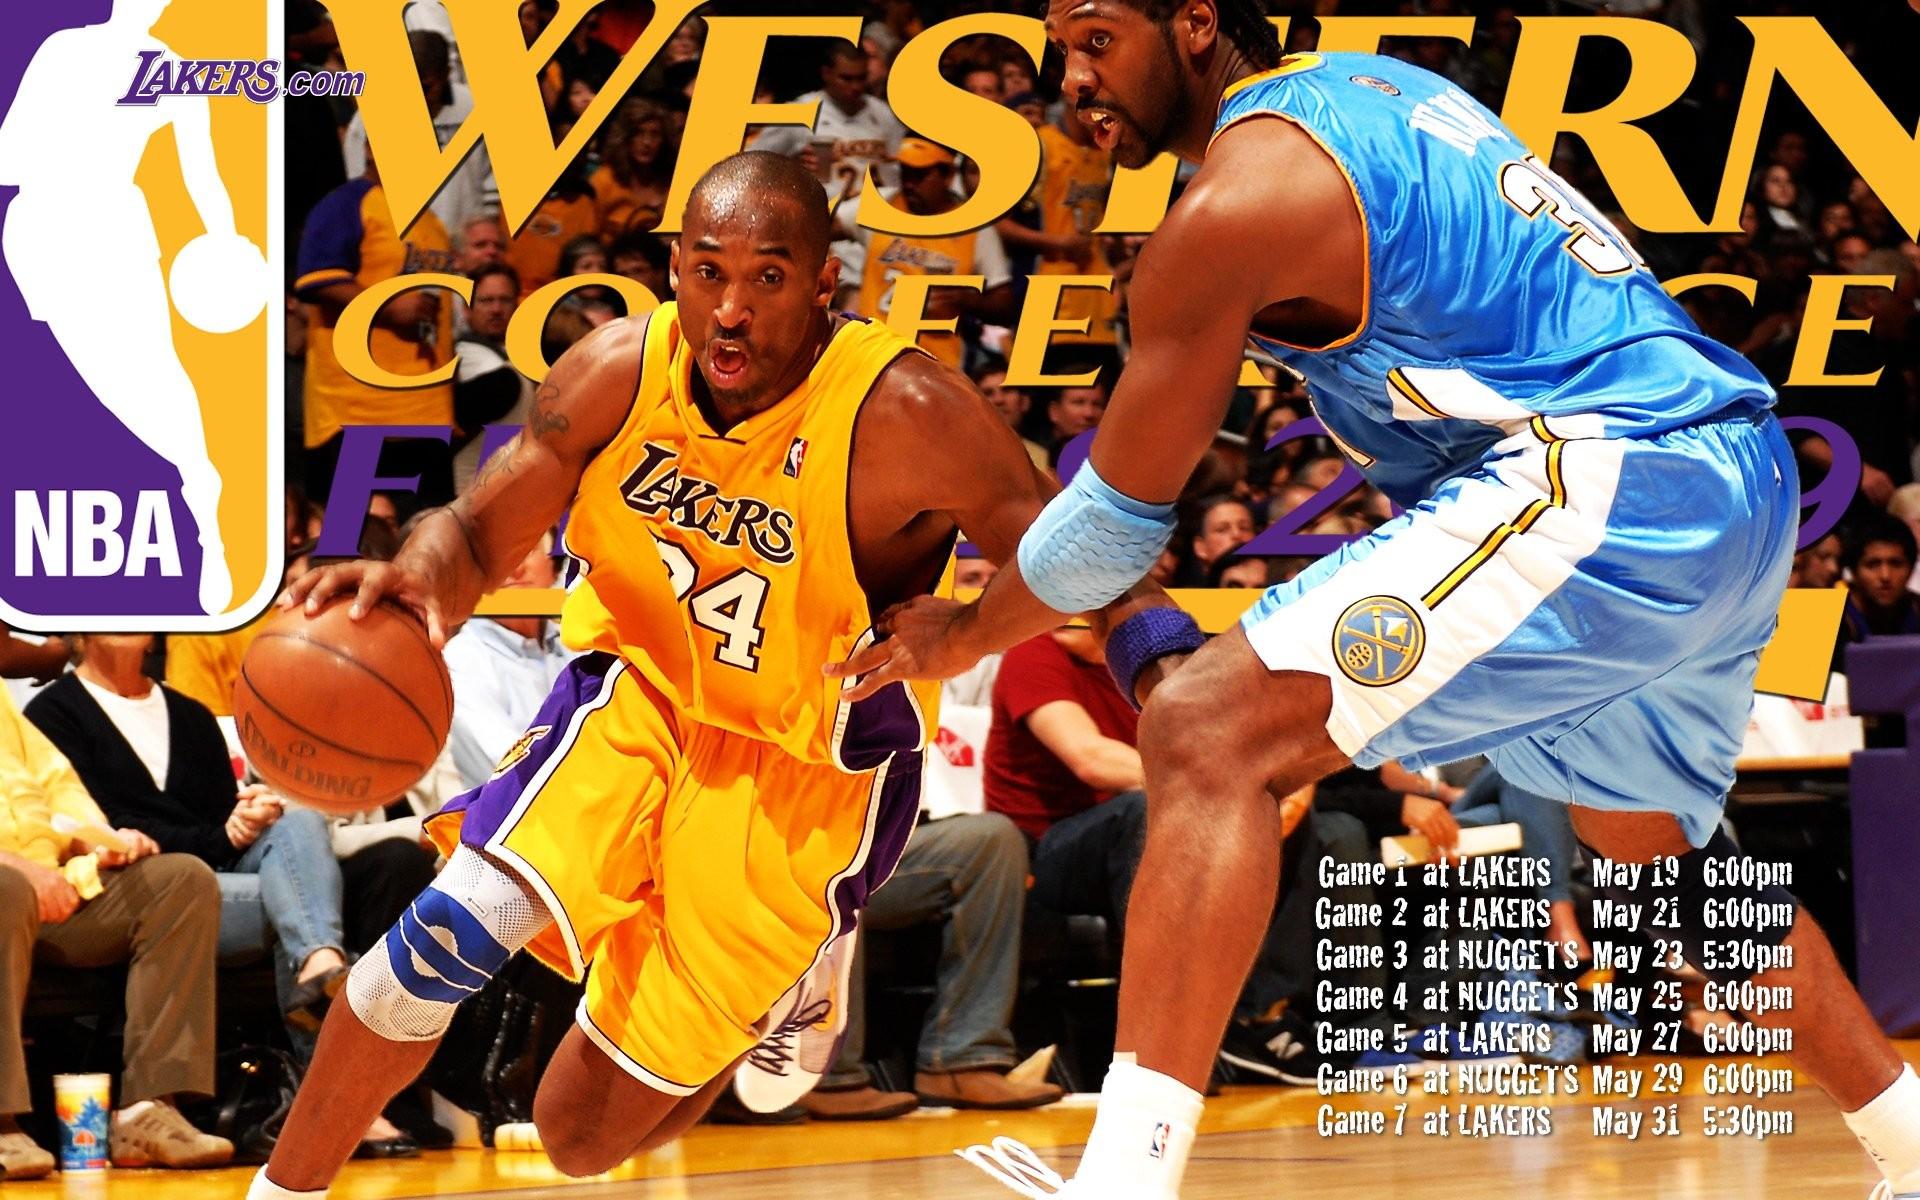 Los Angeles Lakers : Lakers 2009 NBA Champions Wallpapers 1920*1200  Wallpaper 9